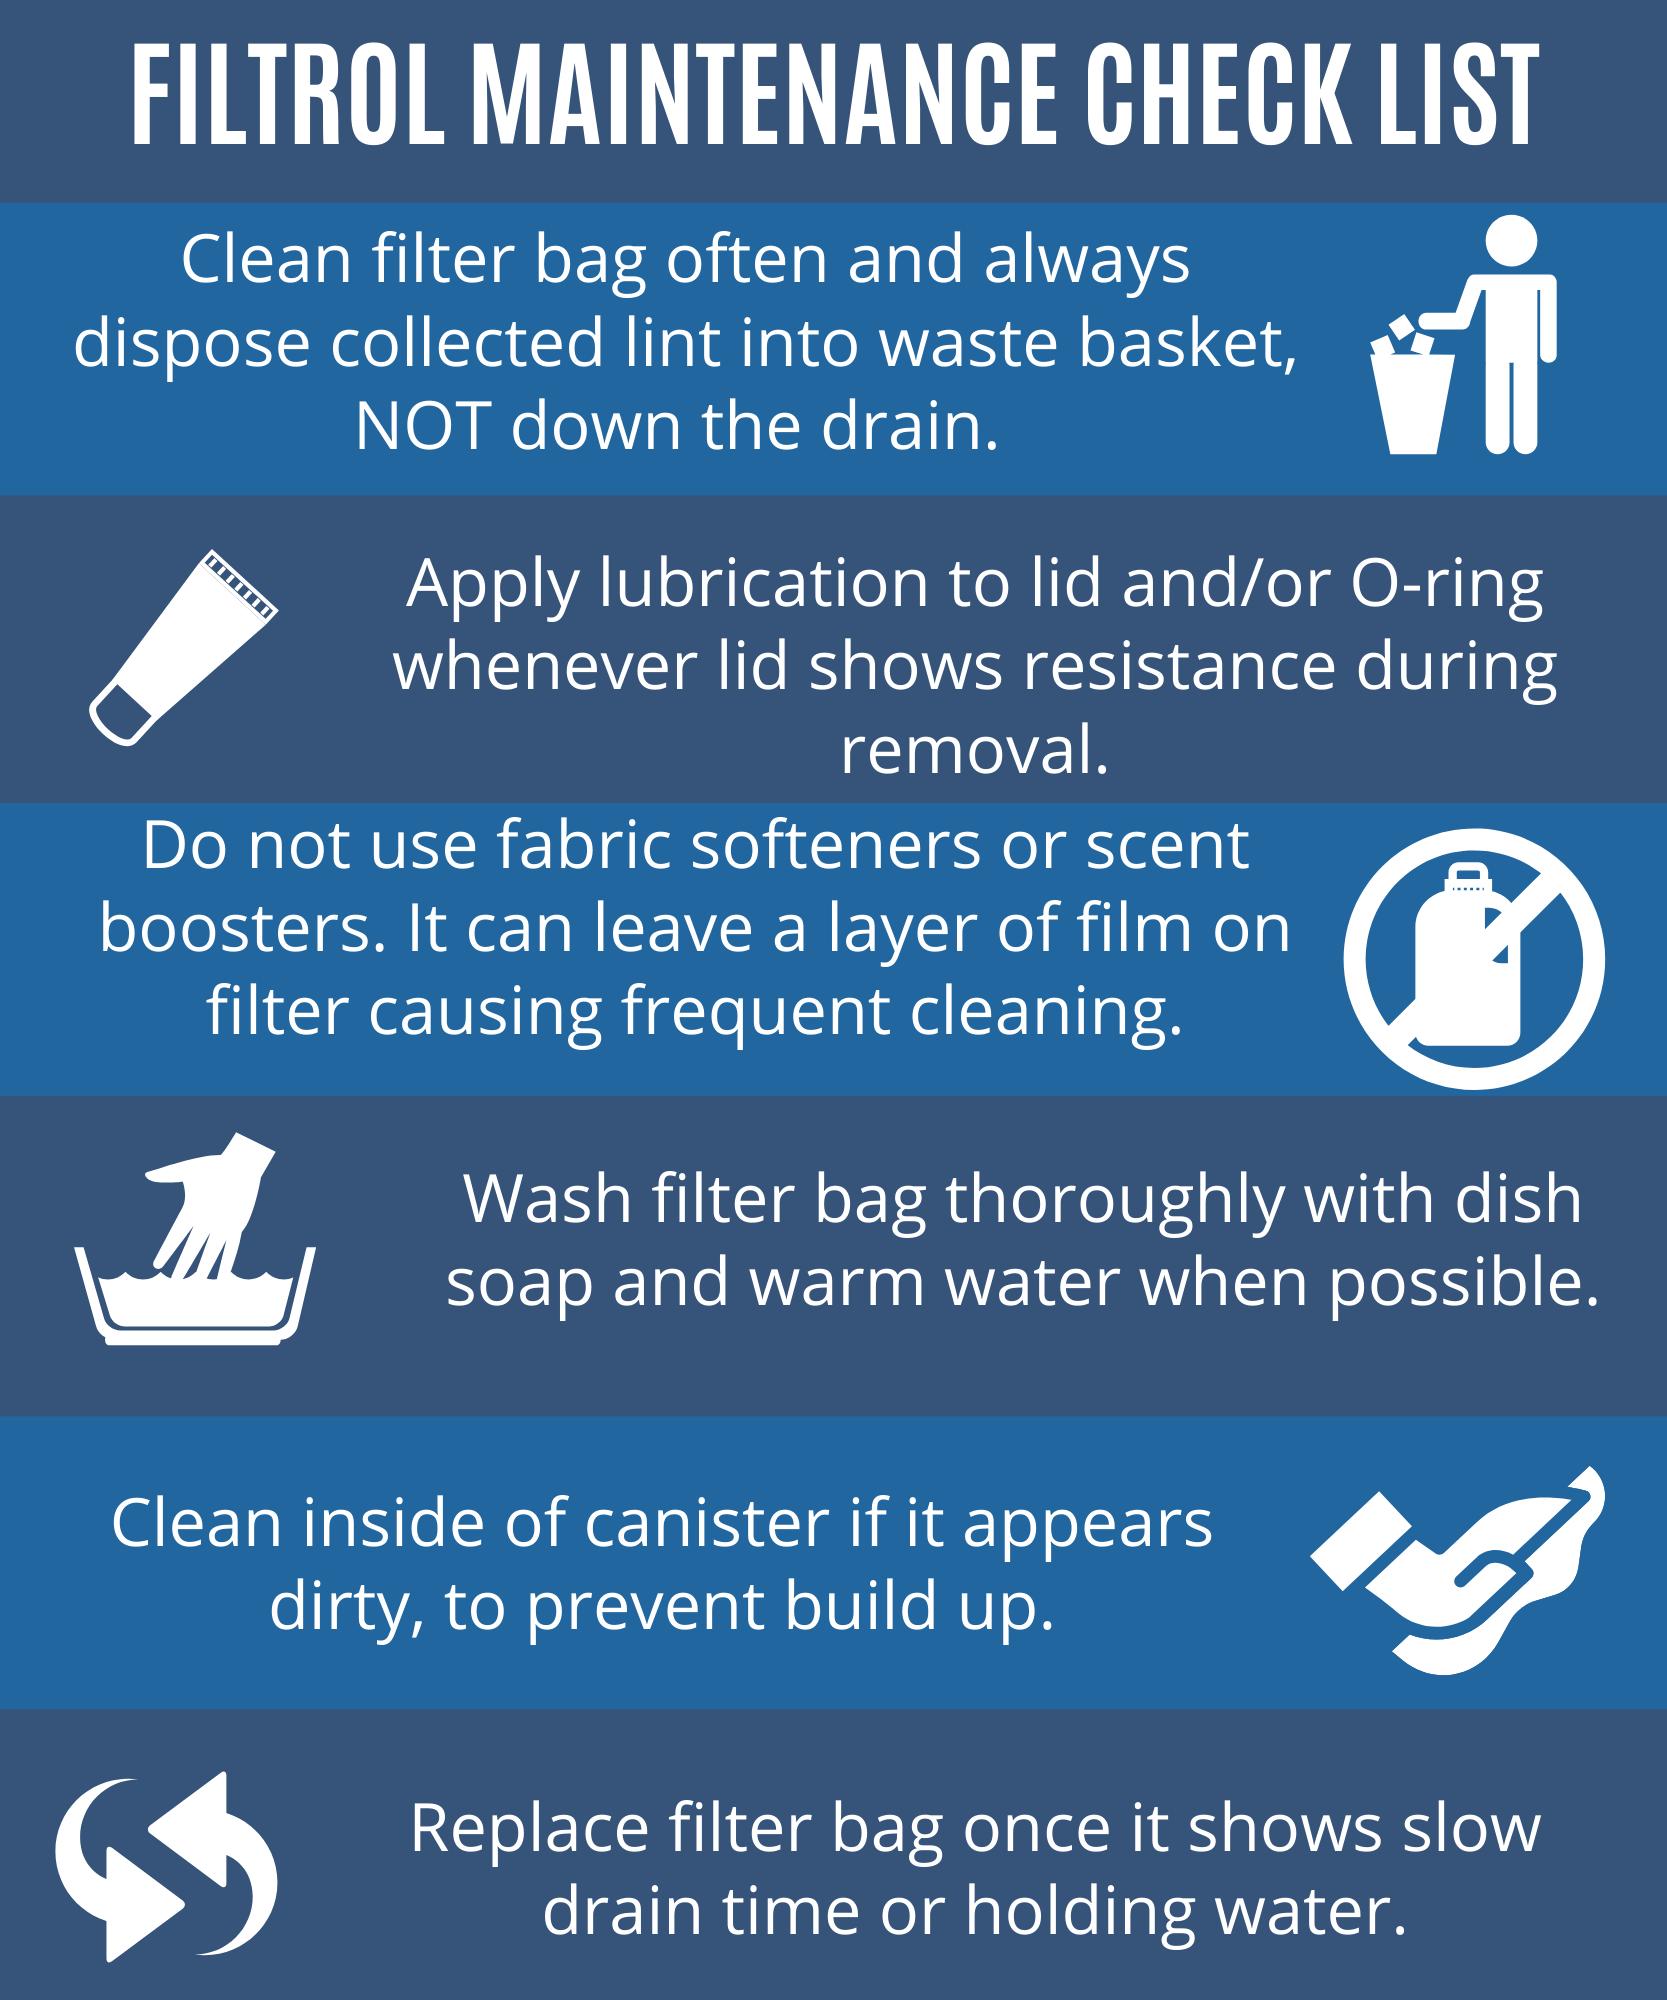 filtrol-maintenance-check-list-4-.png